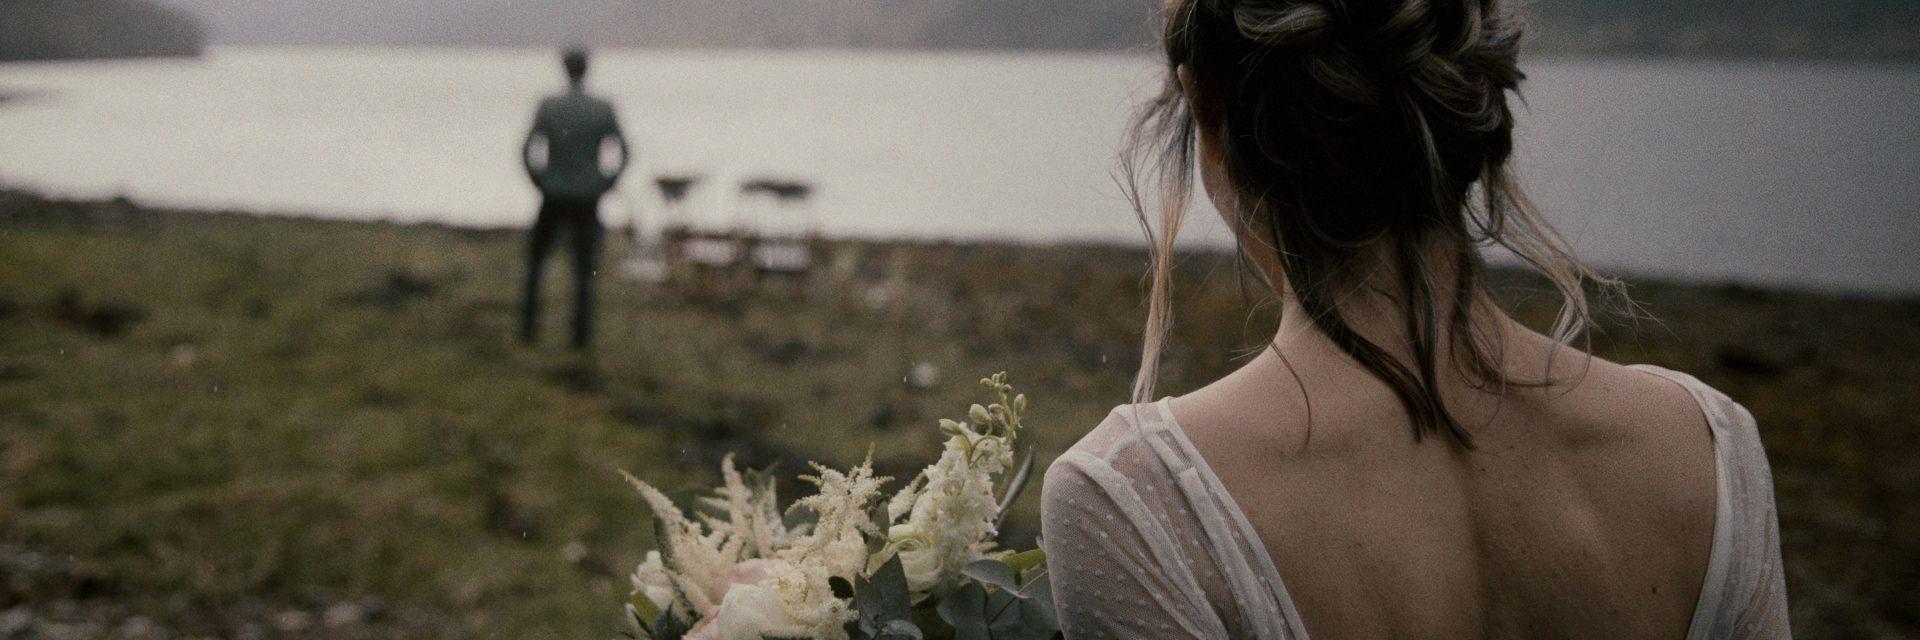 Tangier-wedding-videographer-cinemate-films-02